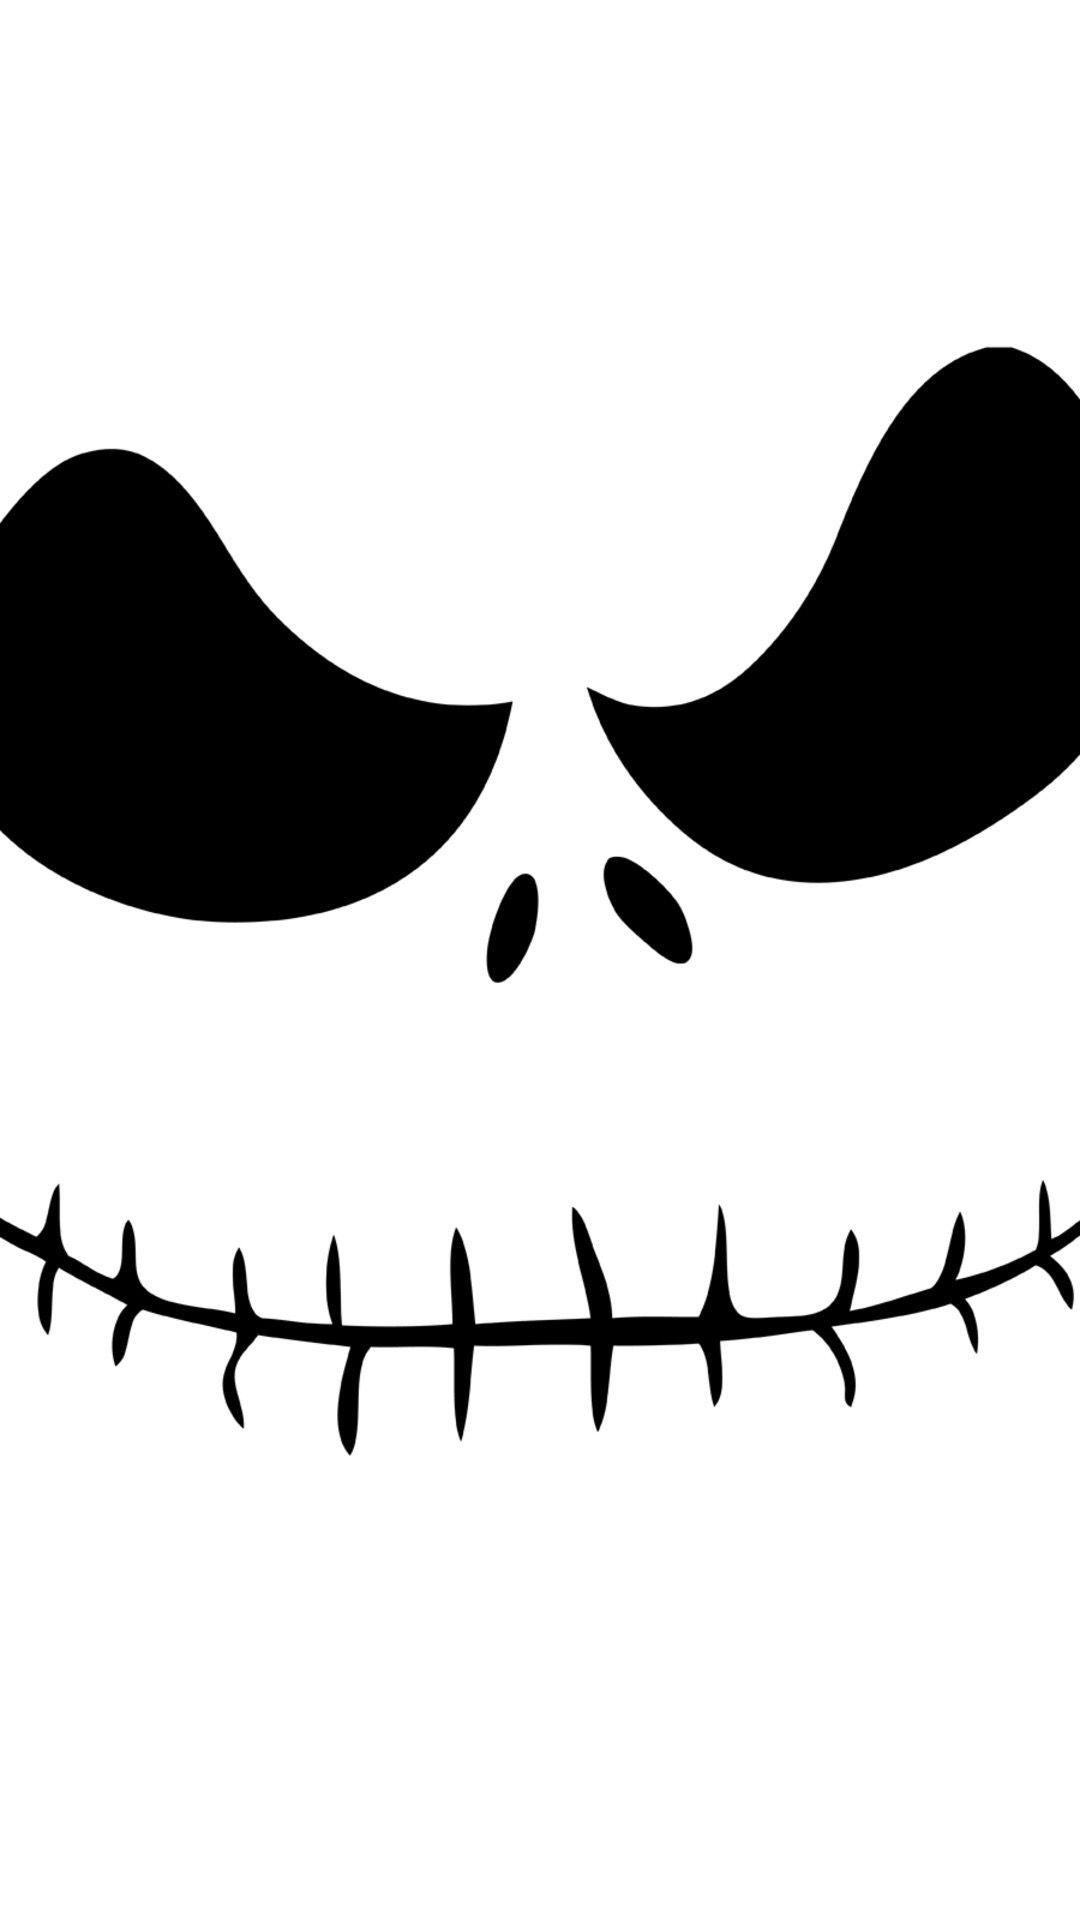 Jack skellington, nightmare before Christmas, movie | Halloween ...